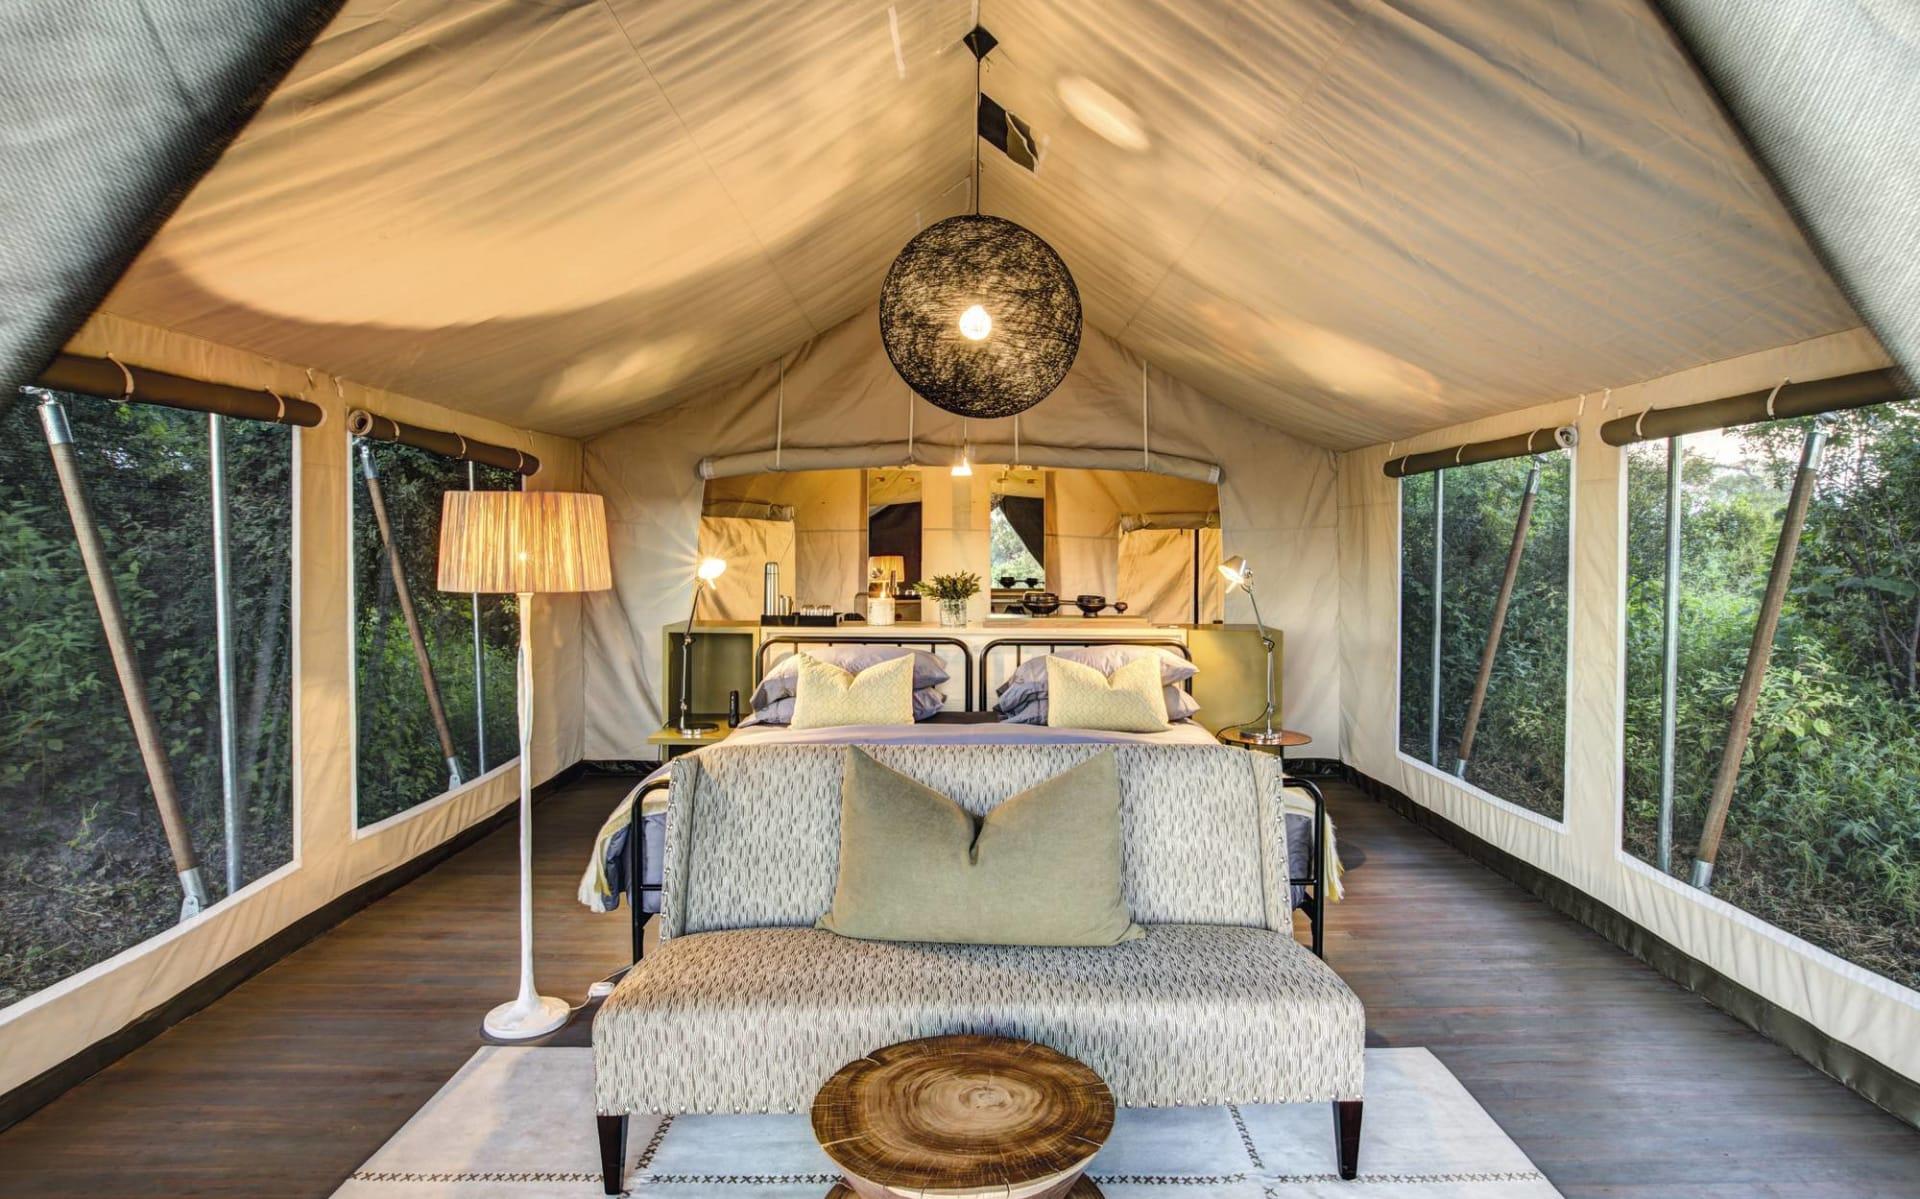 Gomoti Plains Camp in Okavango Delta: zimmer Gomoti - Bett mit Sofa c Machaba Safaris